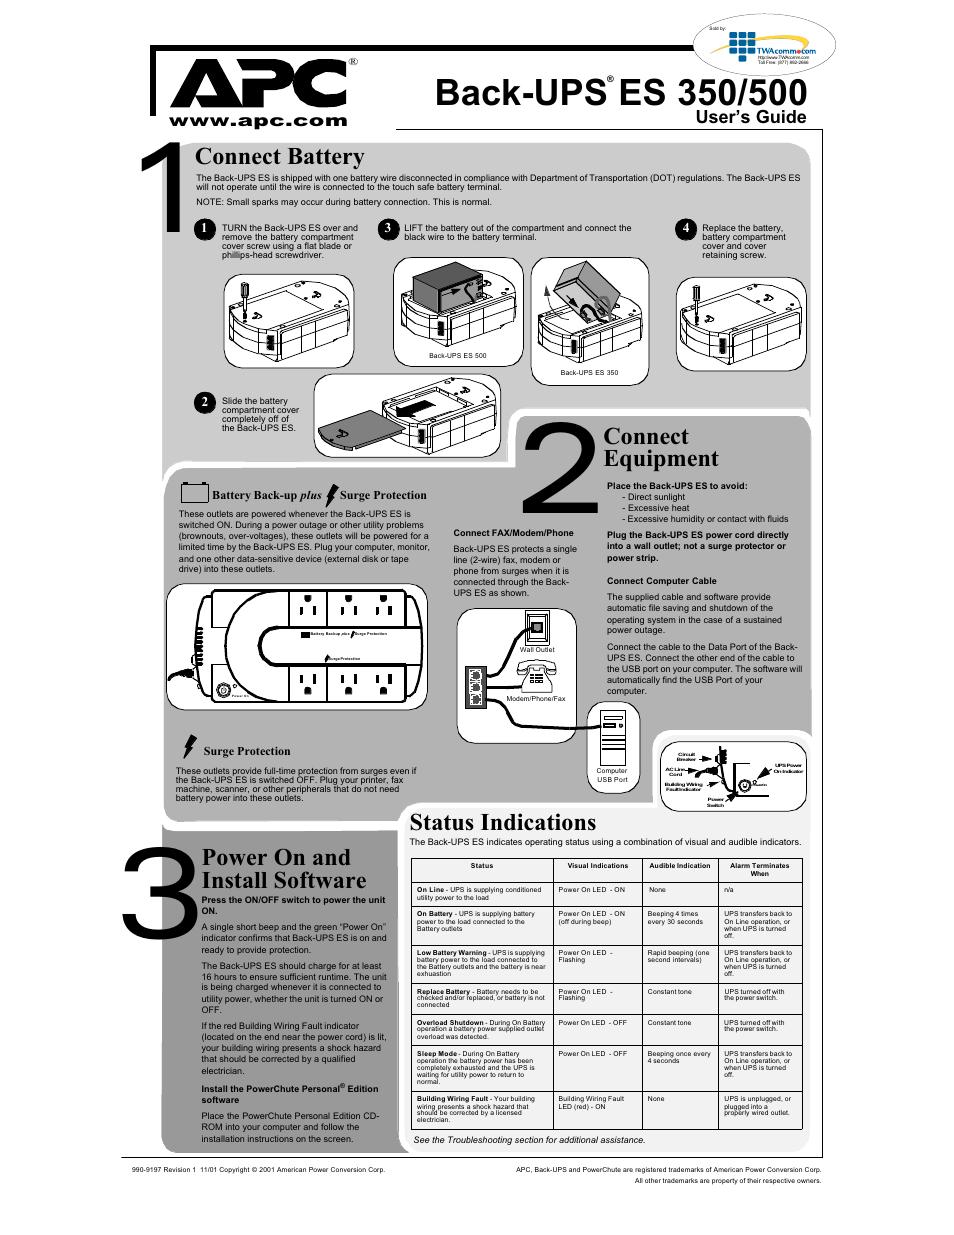 apc es 500 user manual 2 pages